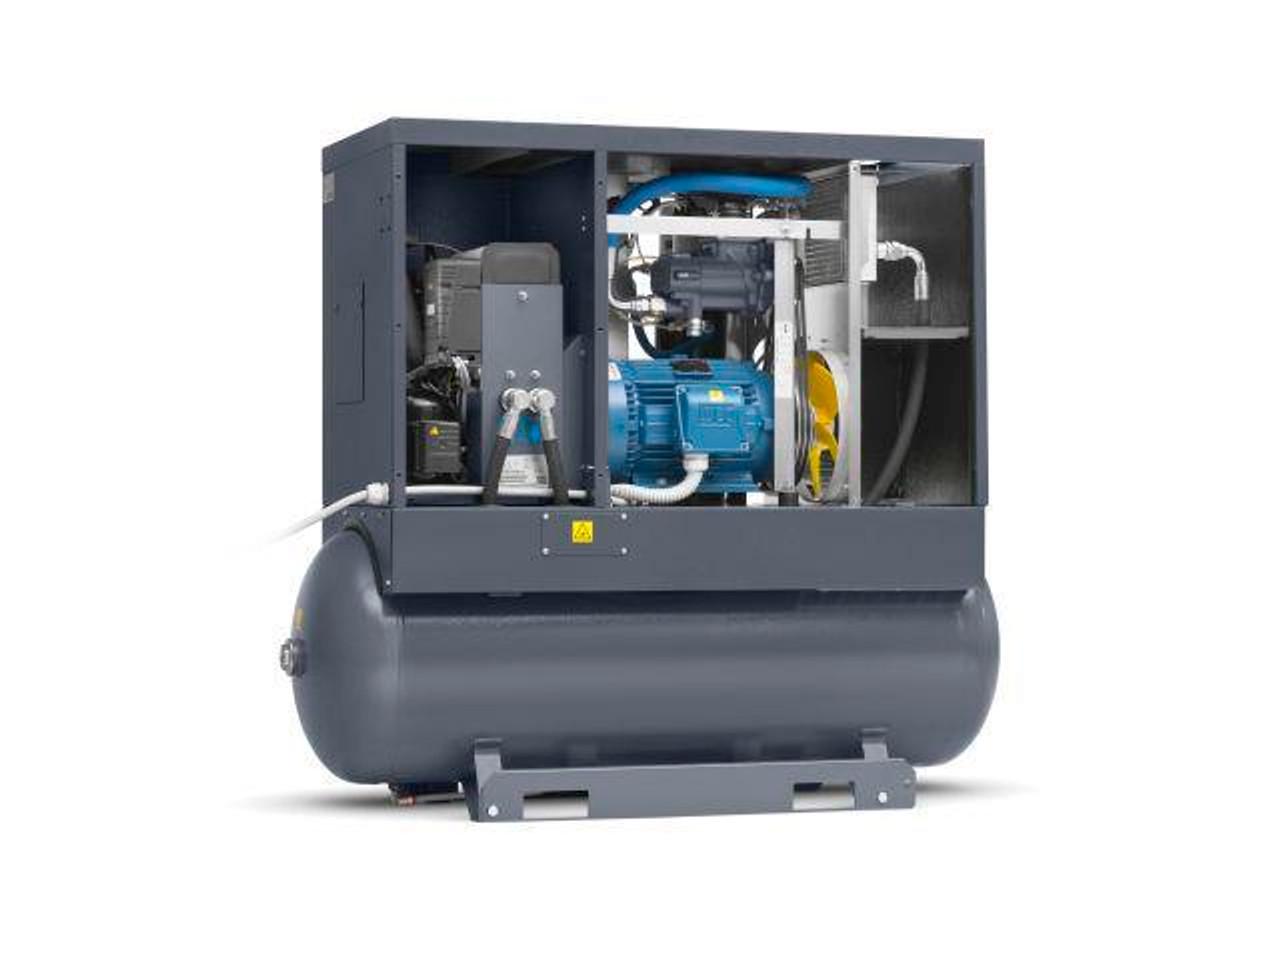 Screw Air Compressor 15PH, 51.5CFM, 145PSI, Tank Mounted